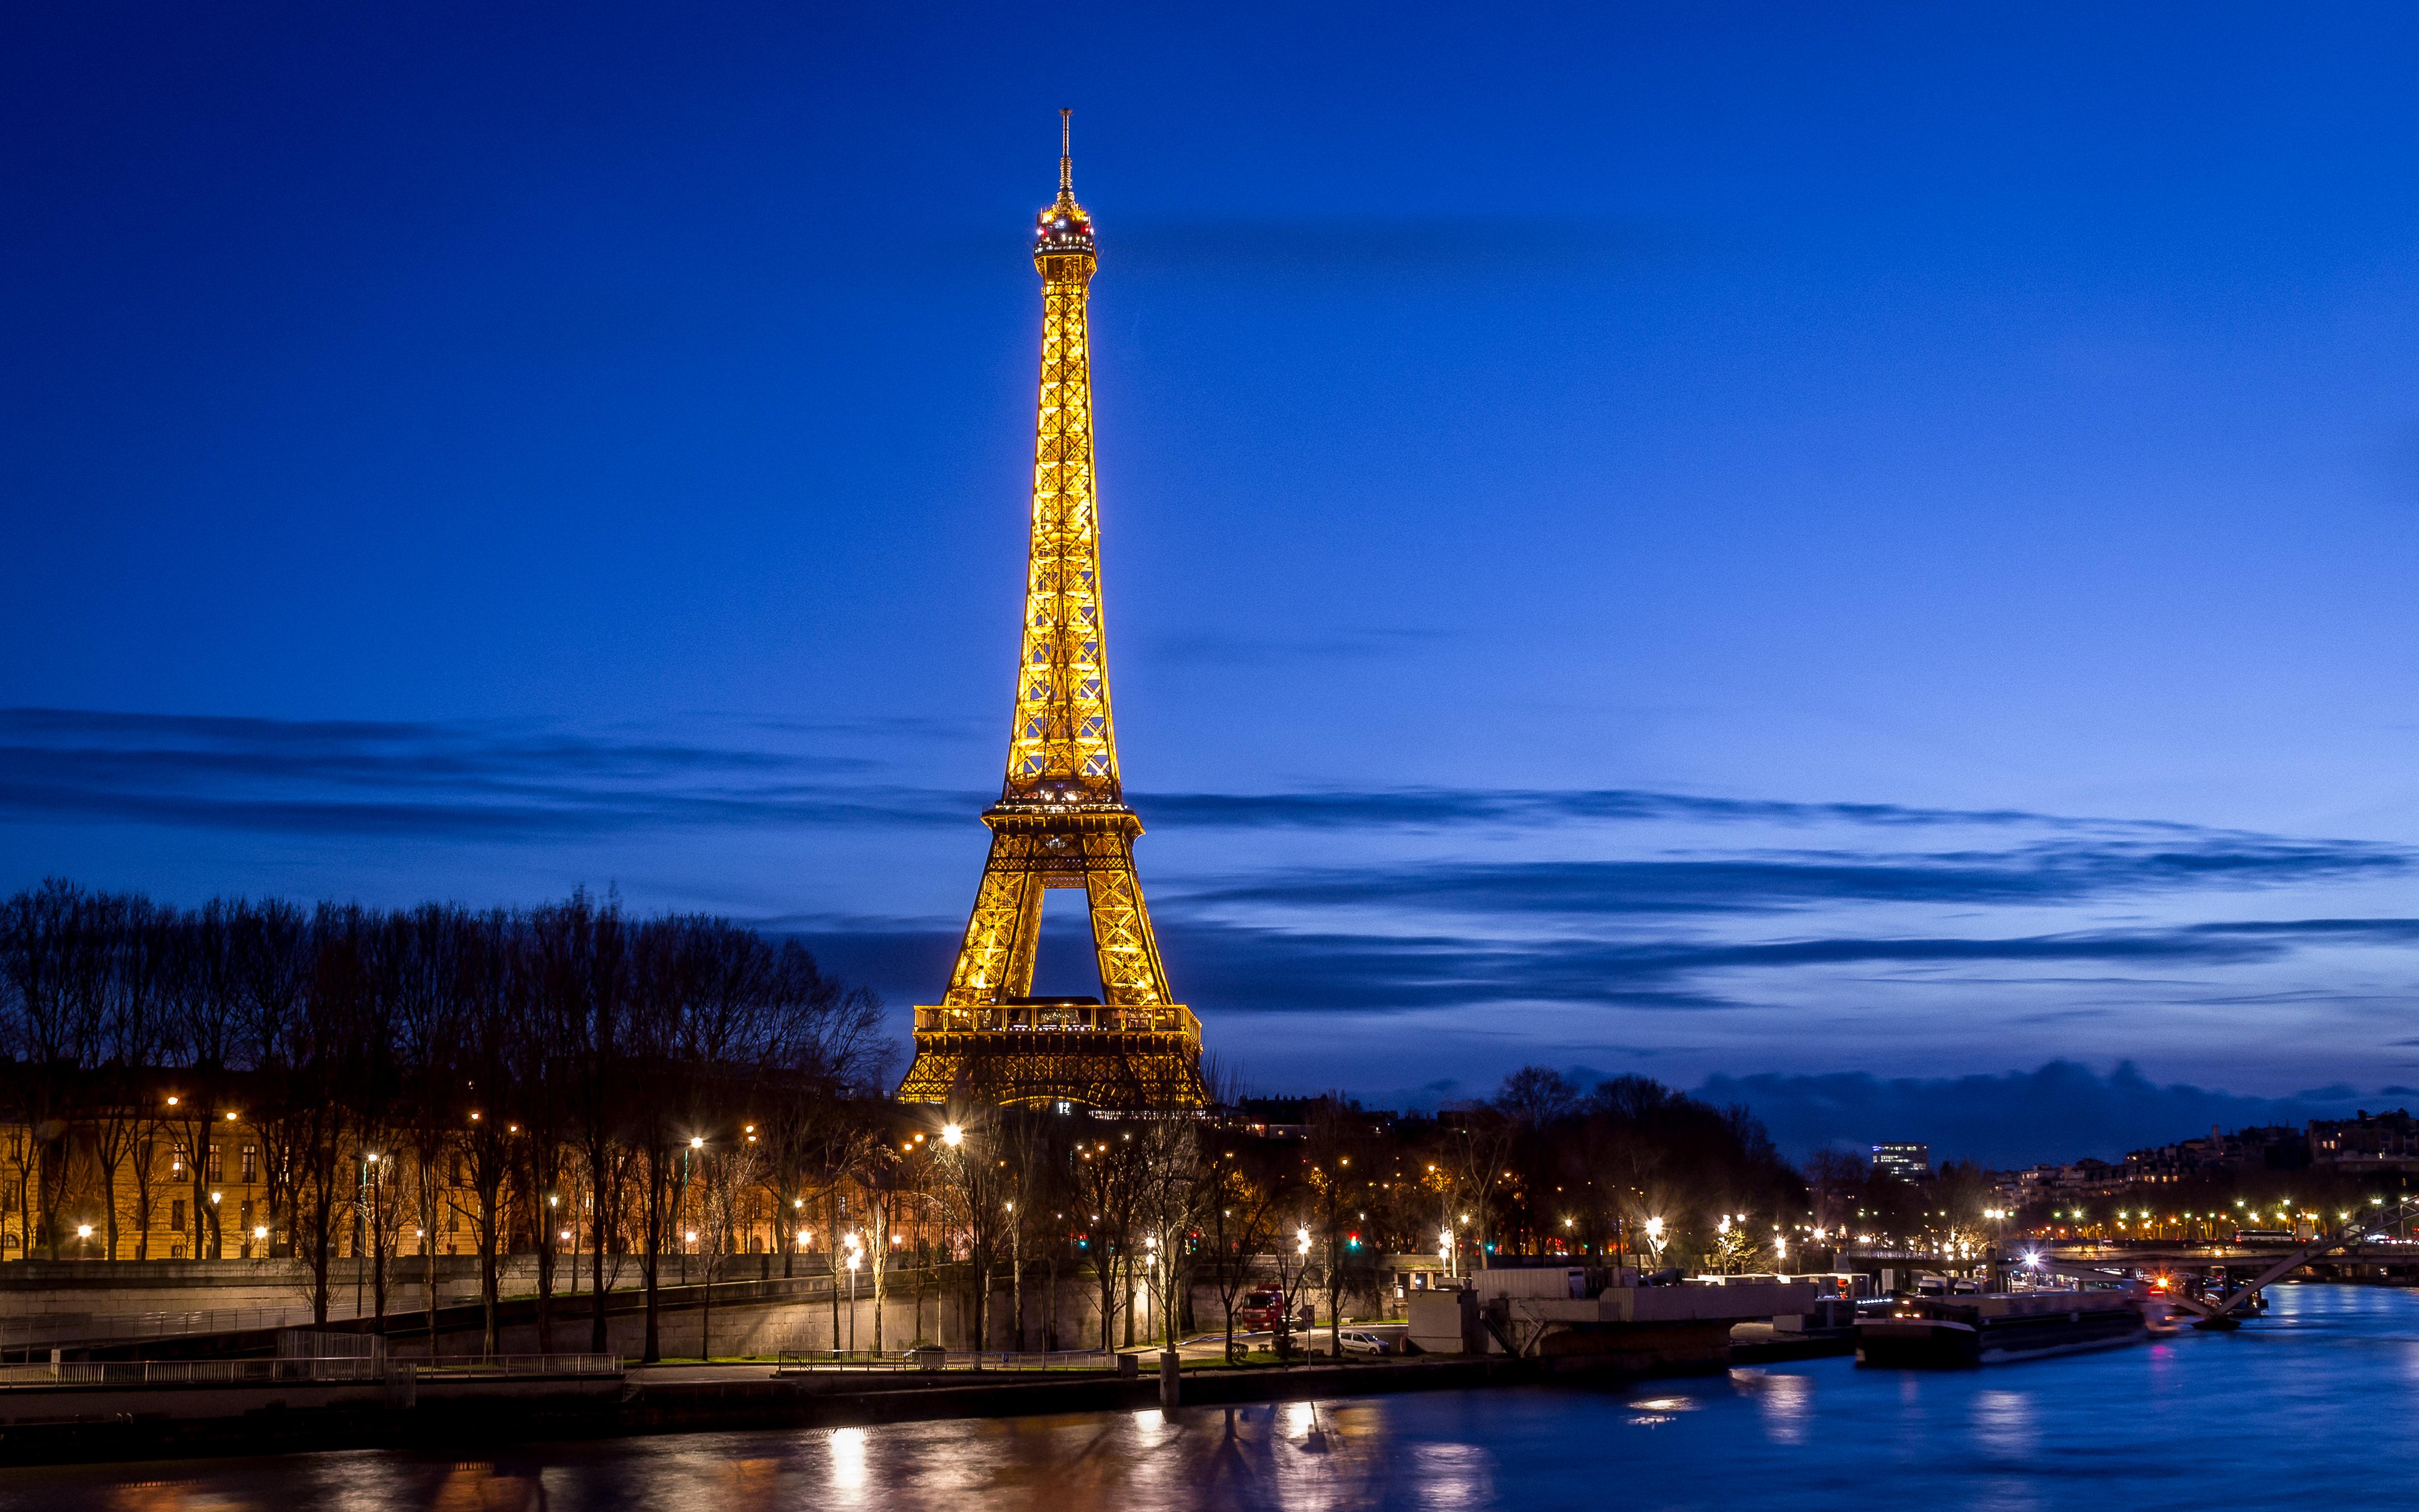 Experience the romance of Paris